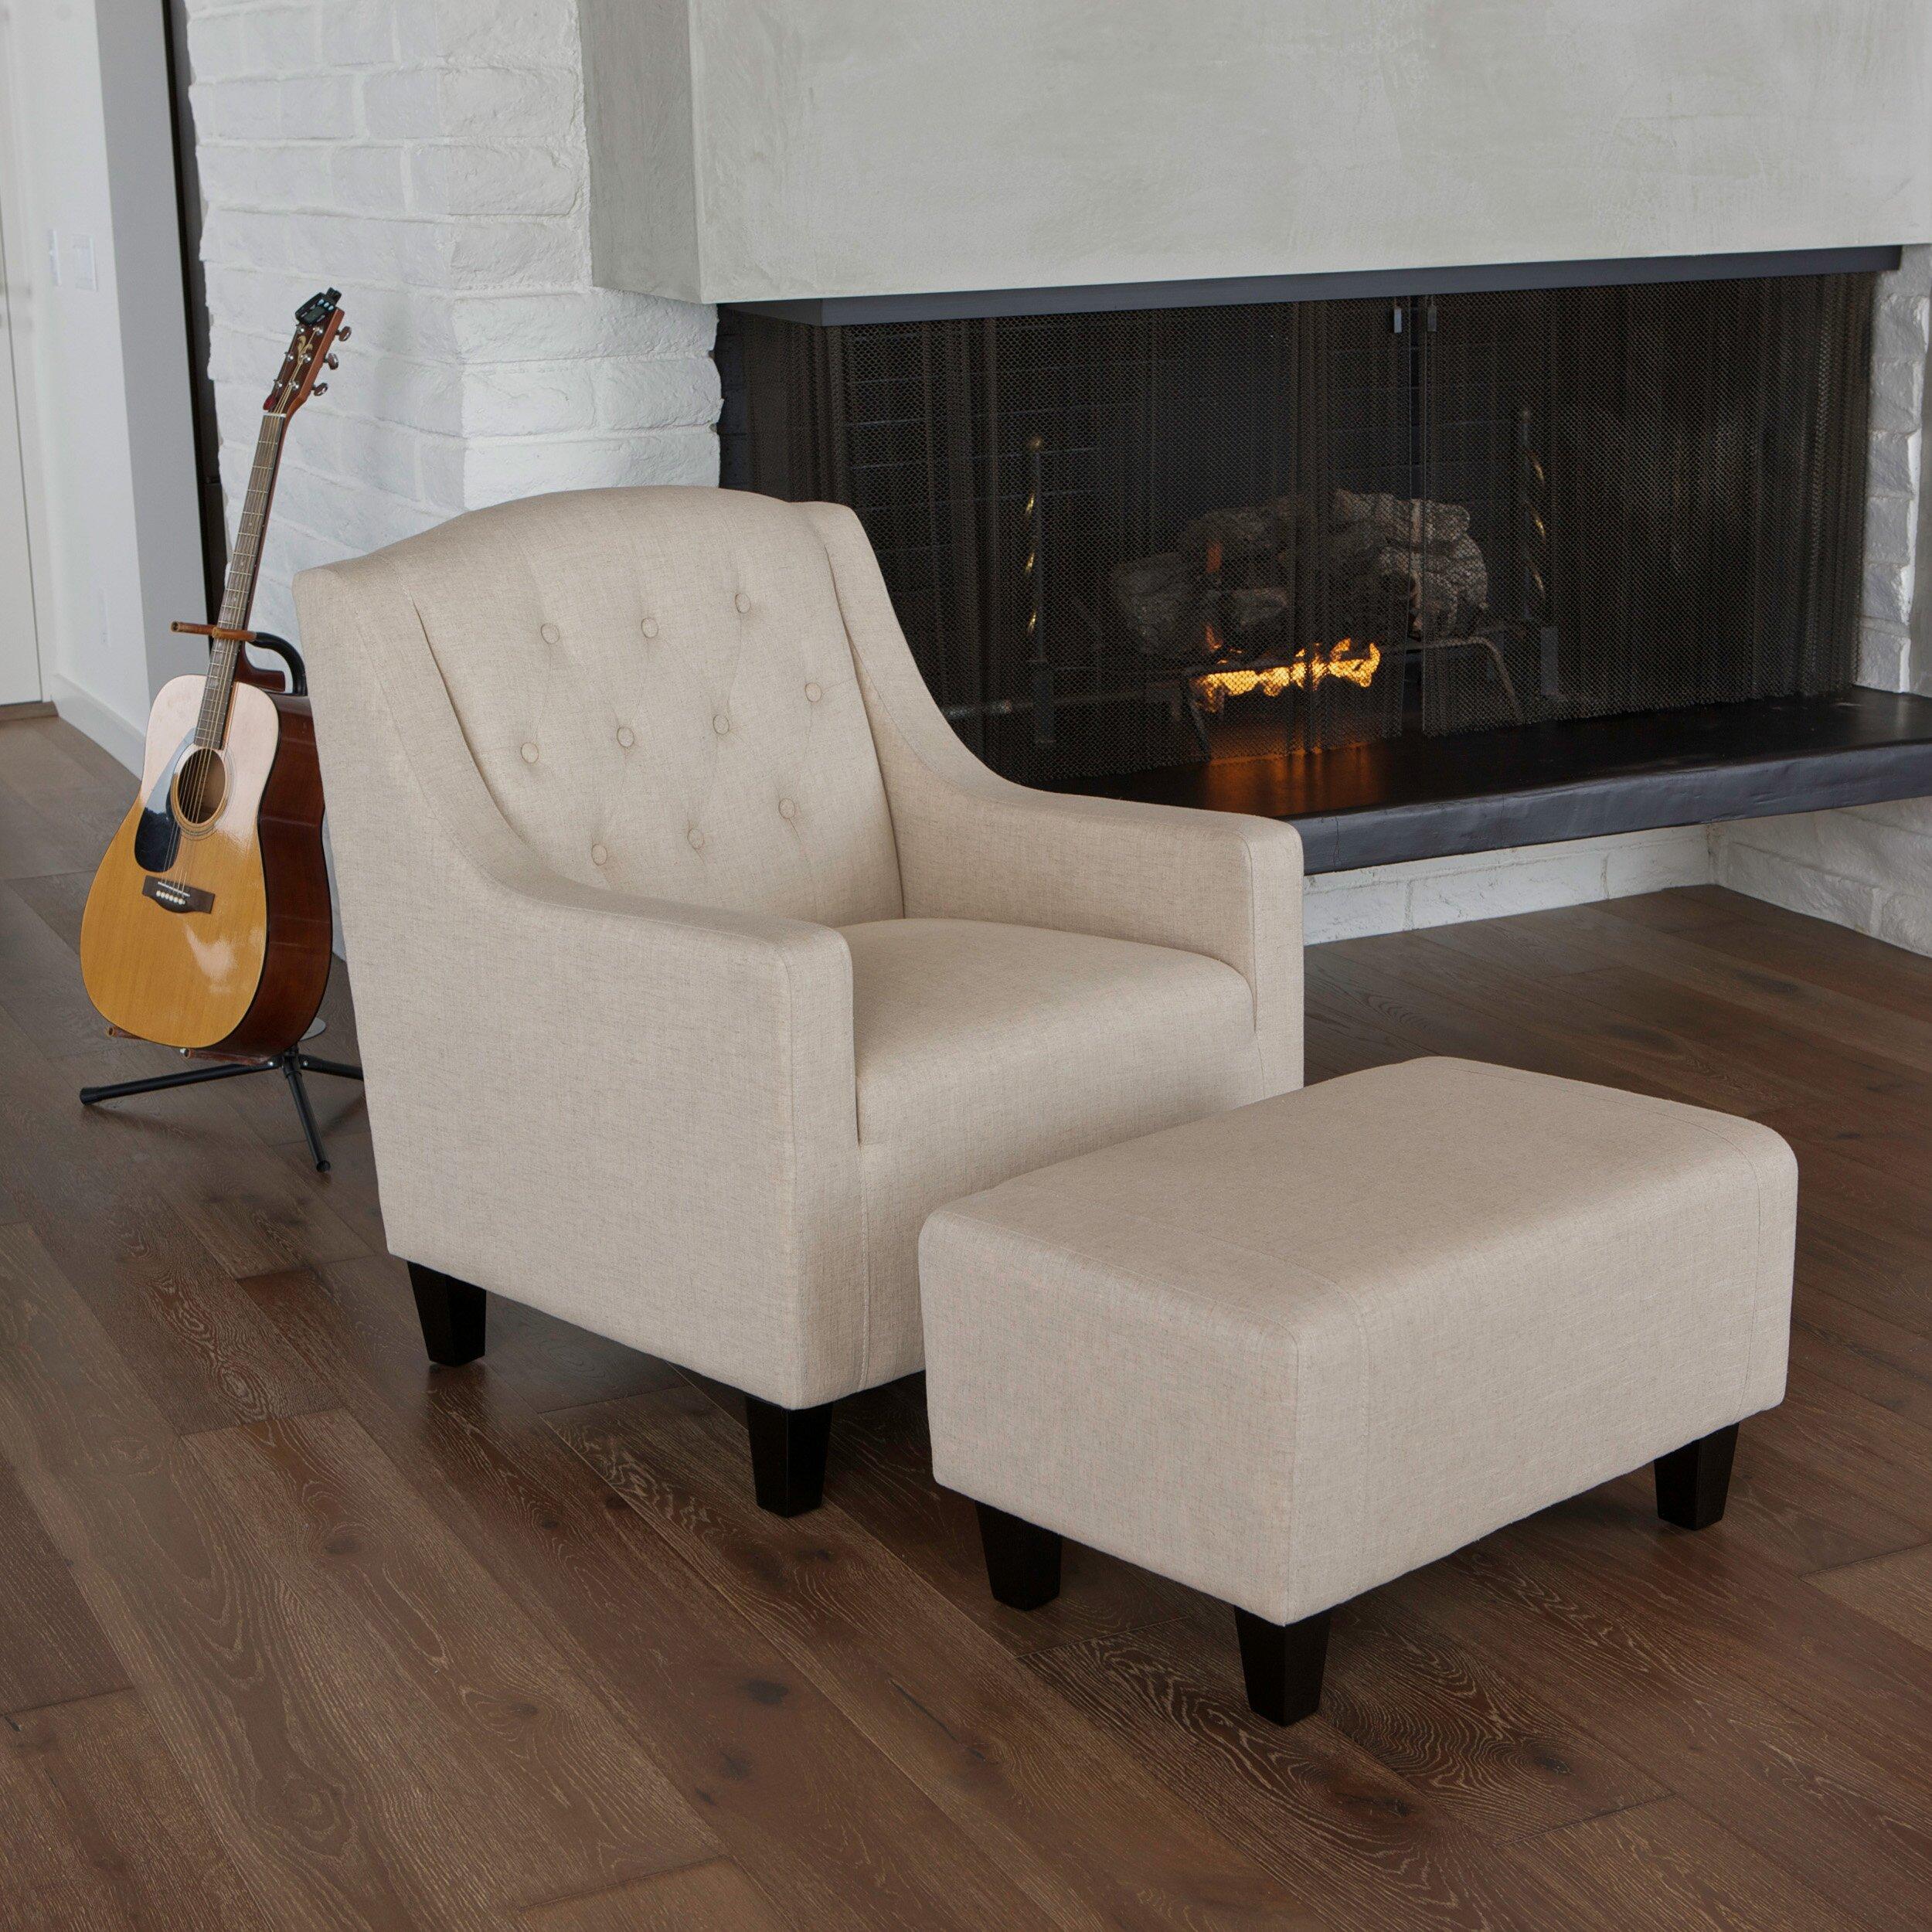 noblehouse ascella armchair reviews wayfair uk. Black Bedroom Furniture Sets. Home Design Ideas